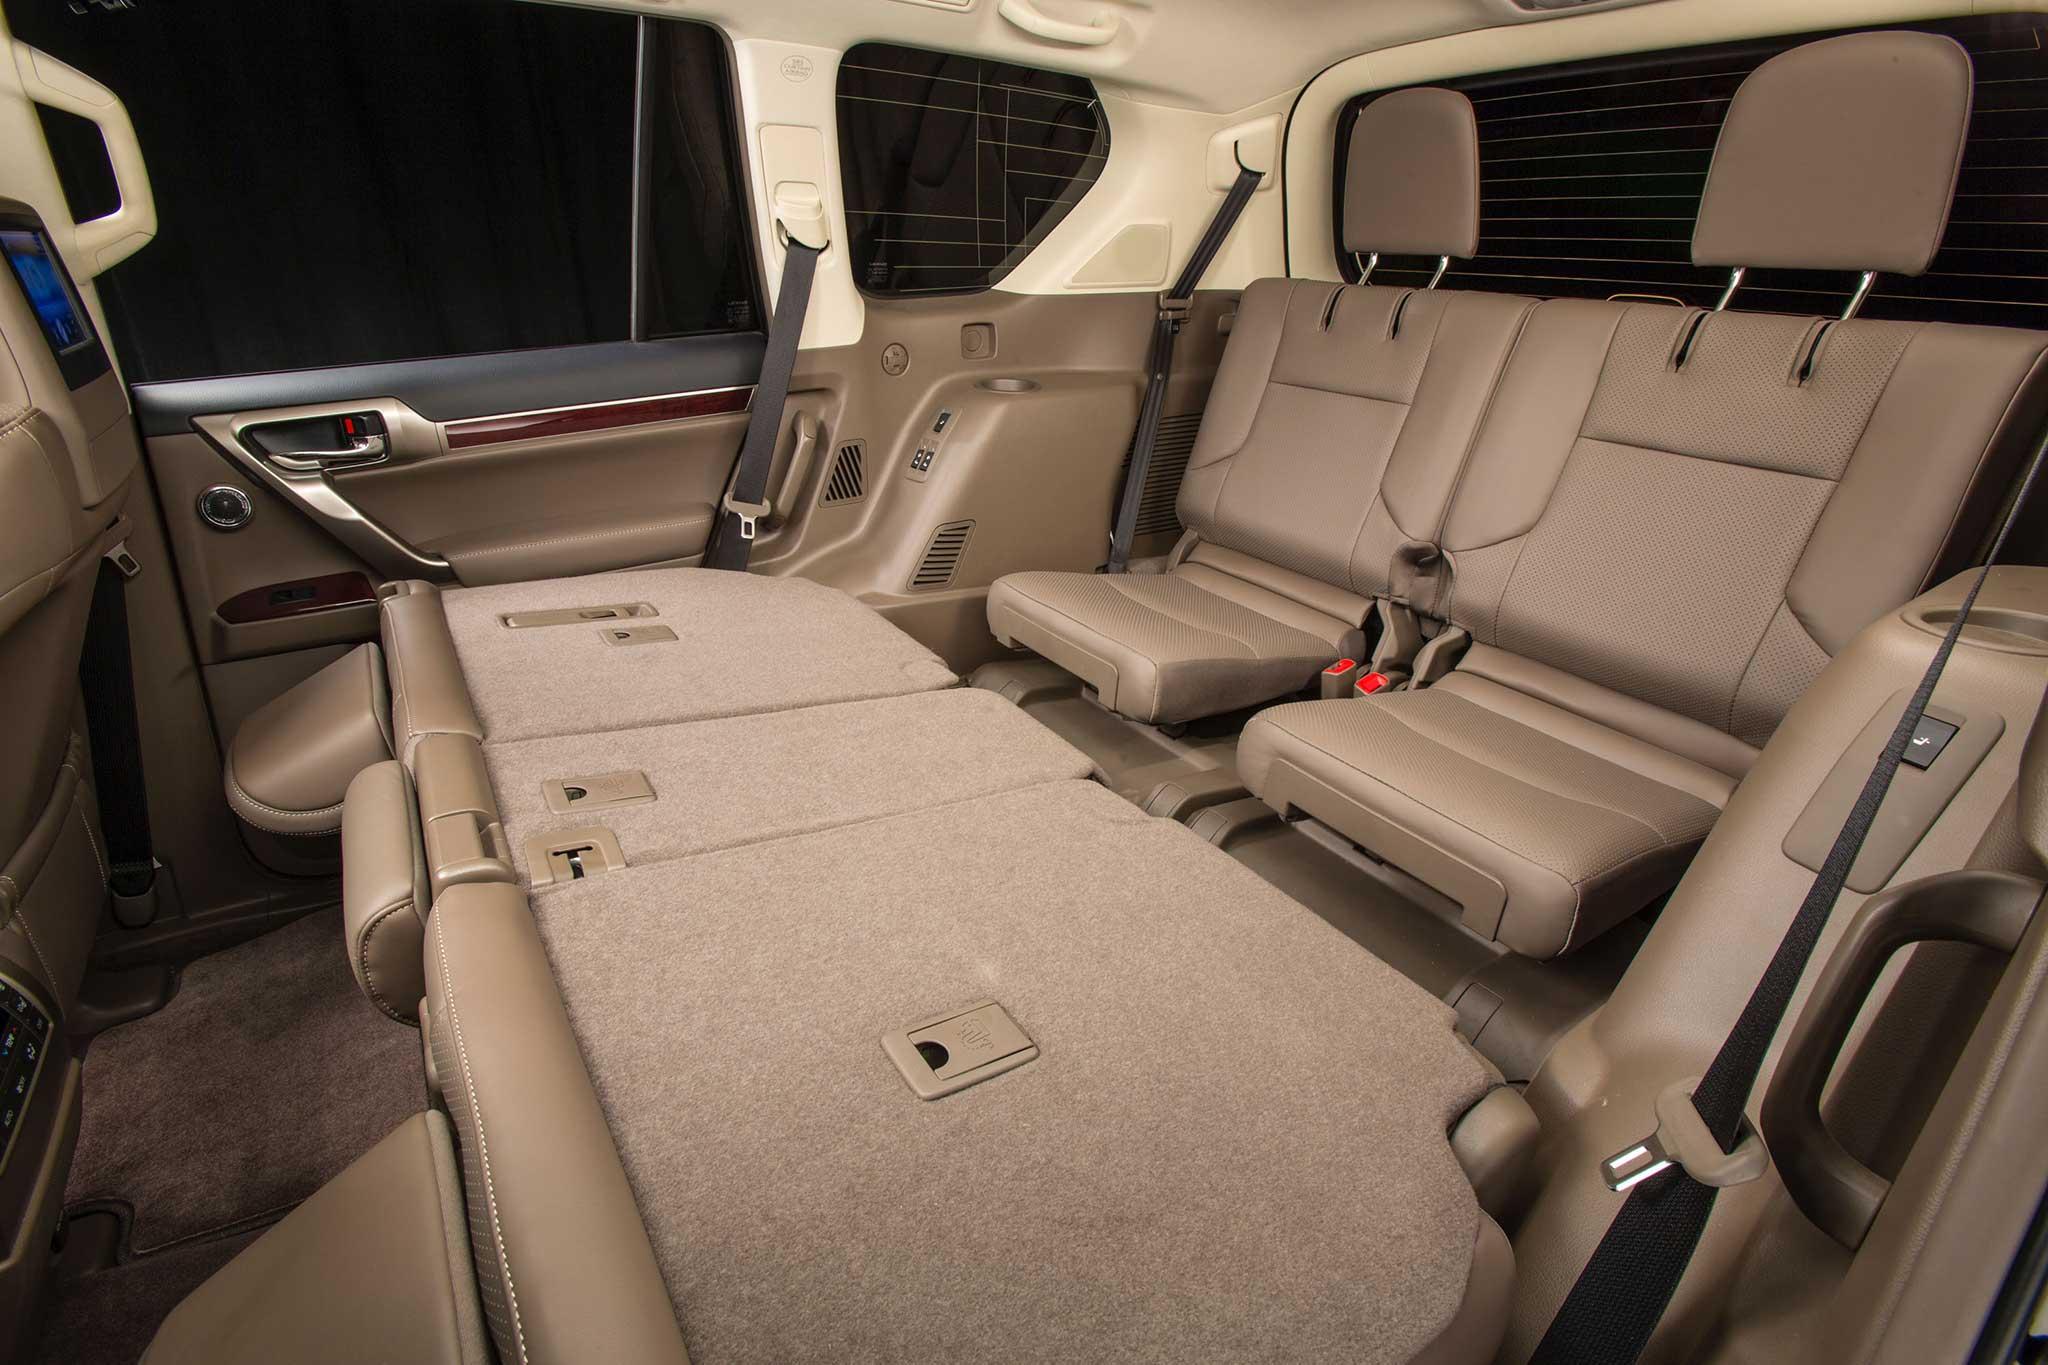 2018 lexus 7 passenger suv. interesting passenger show more inside 2018 lexus 7 passenger suv p